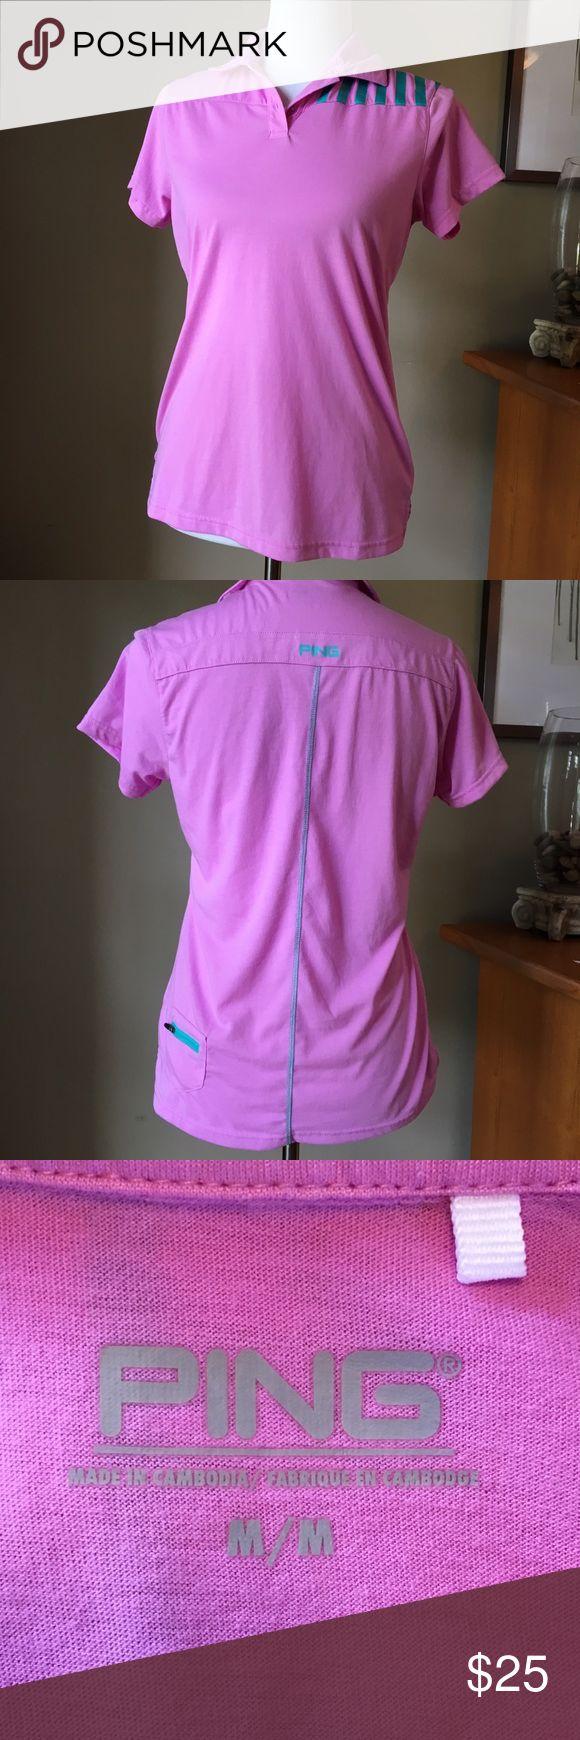 Ping women's golf shirt M Sensor cool golf shirt with key pocket on back Ping Tops